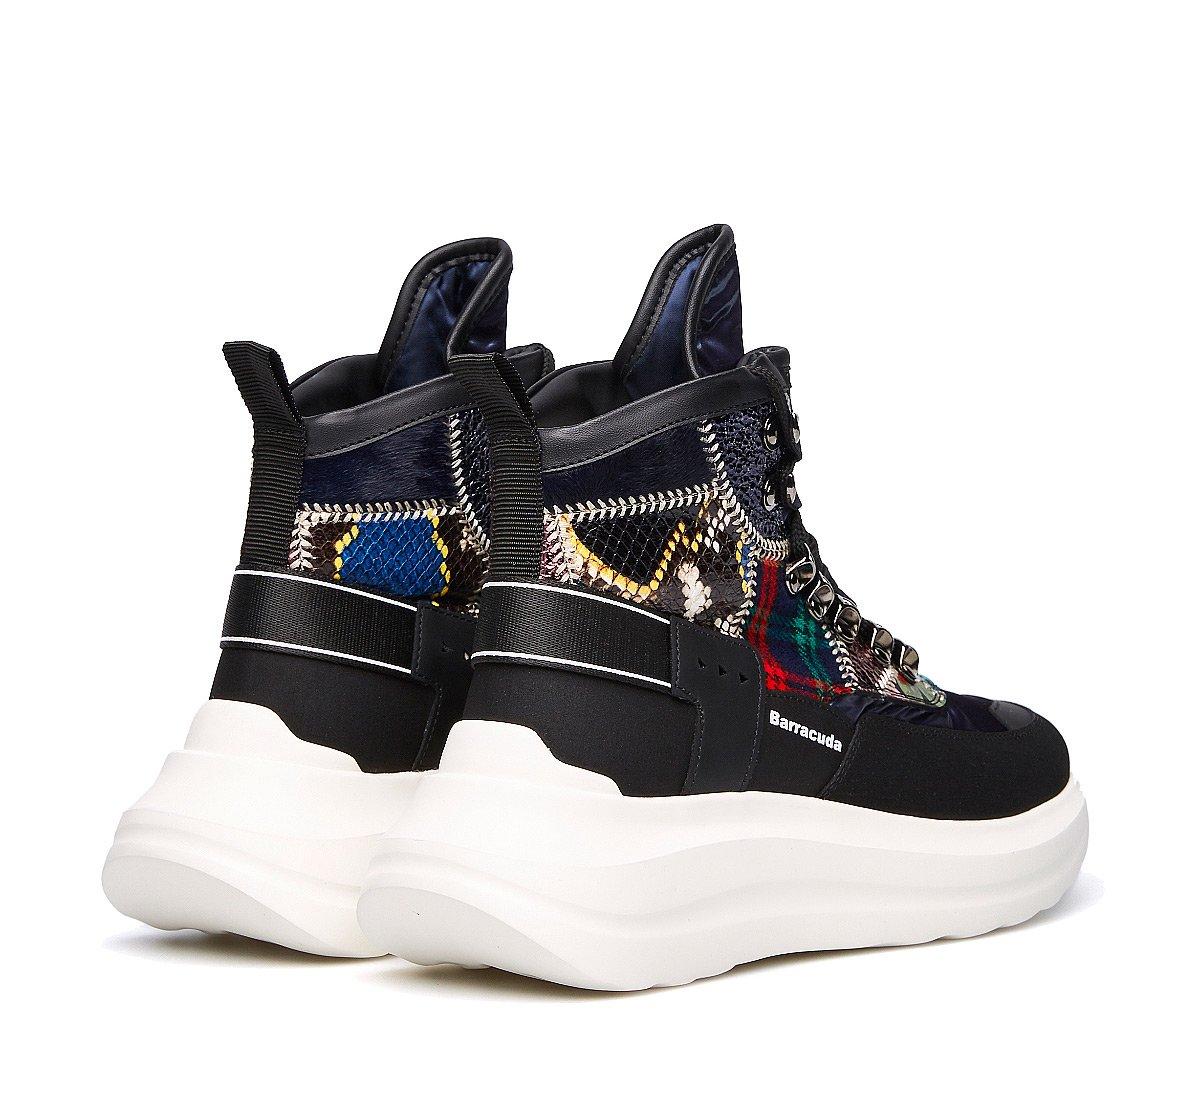 Sneaker Barracuda Freedom 4